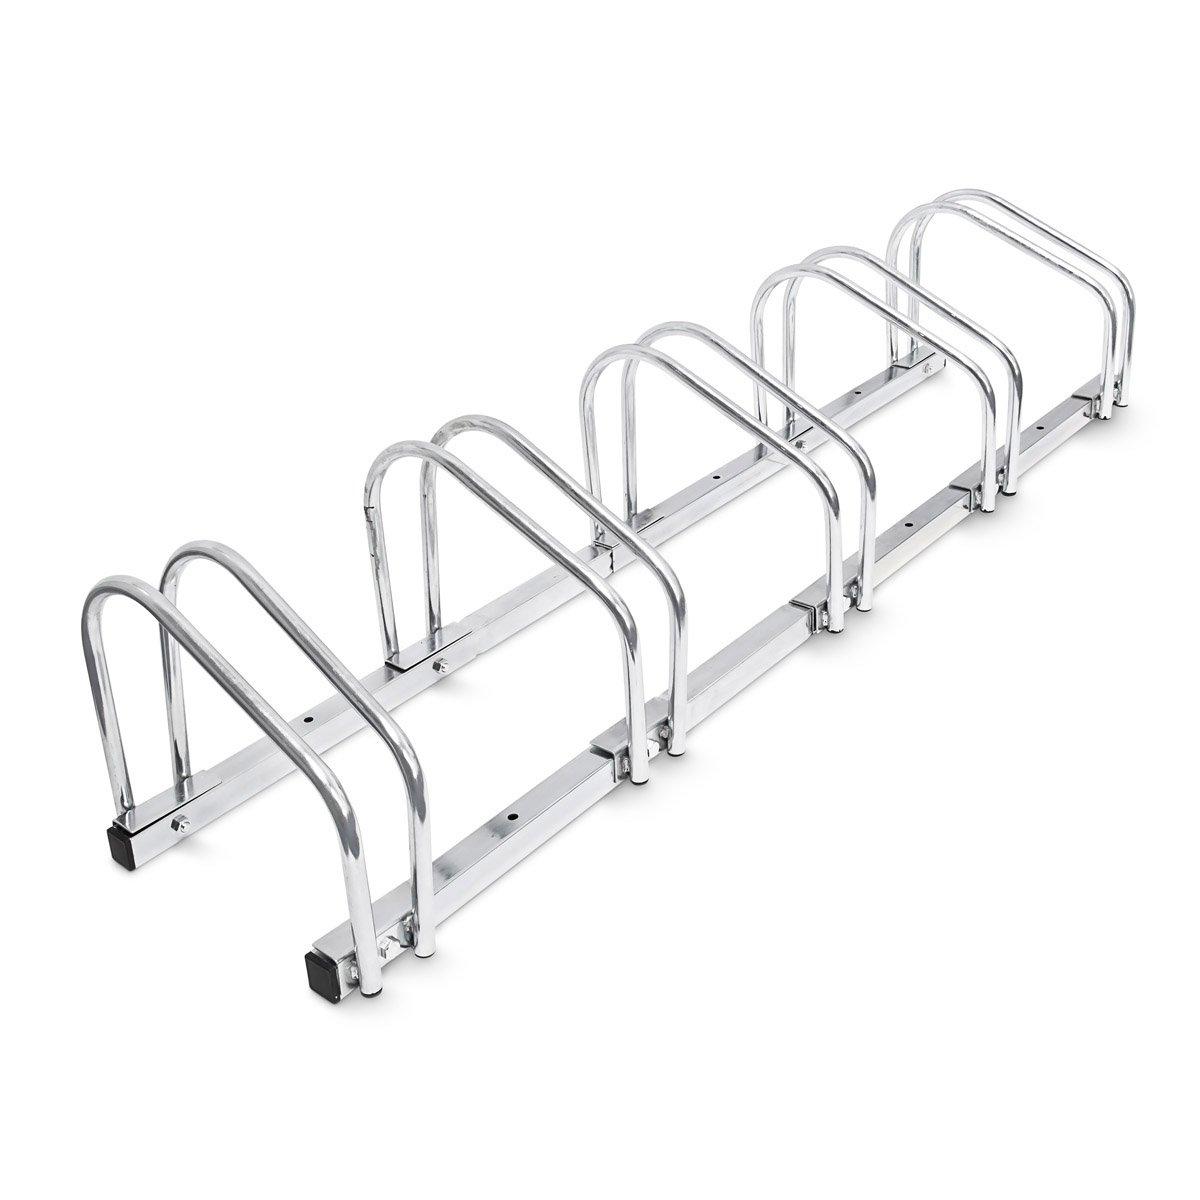 Relaxdays Soporte para bicicletas Para toda la familia Montaje a pared o suelo product image